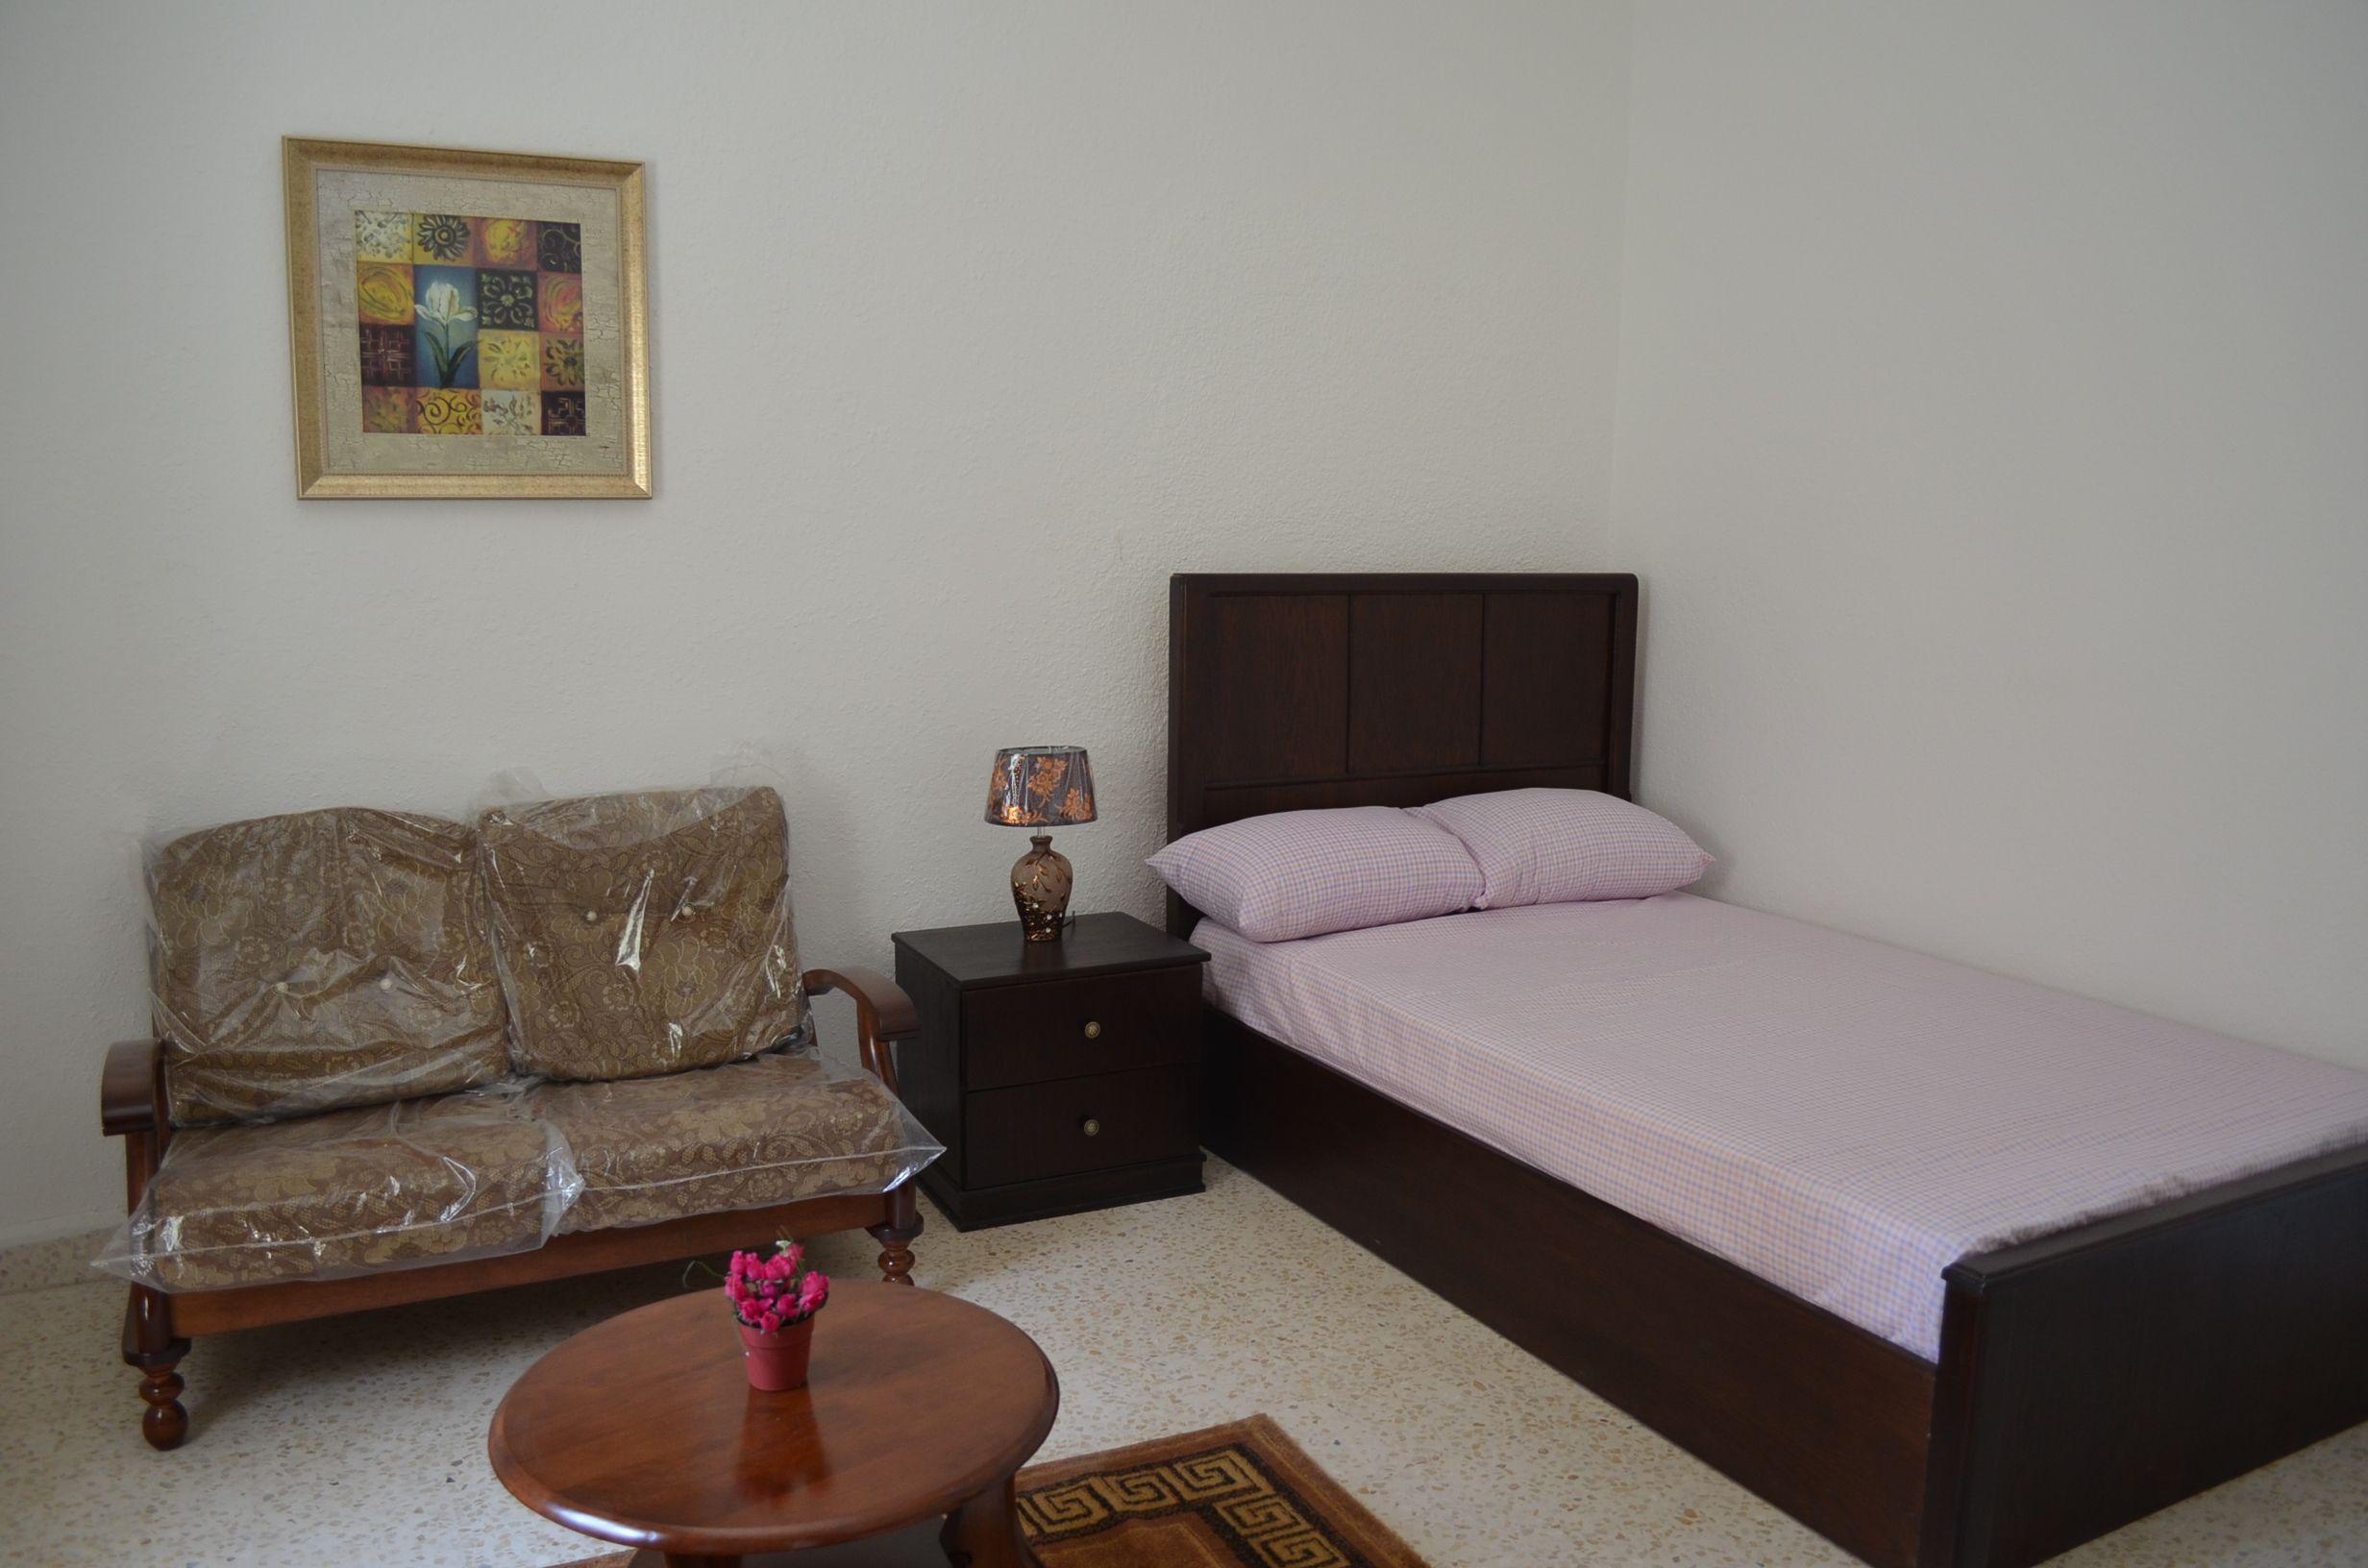 Rent One Bedroom Apartments For Amman Jordan Ezrent Cheap Apartment Nghi Tam Village Hanoi